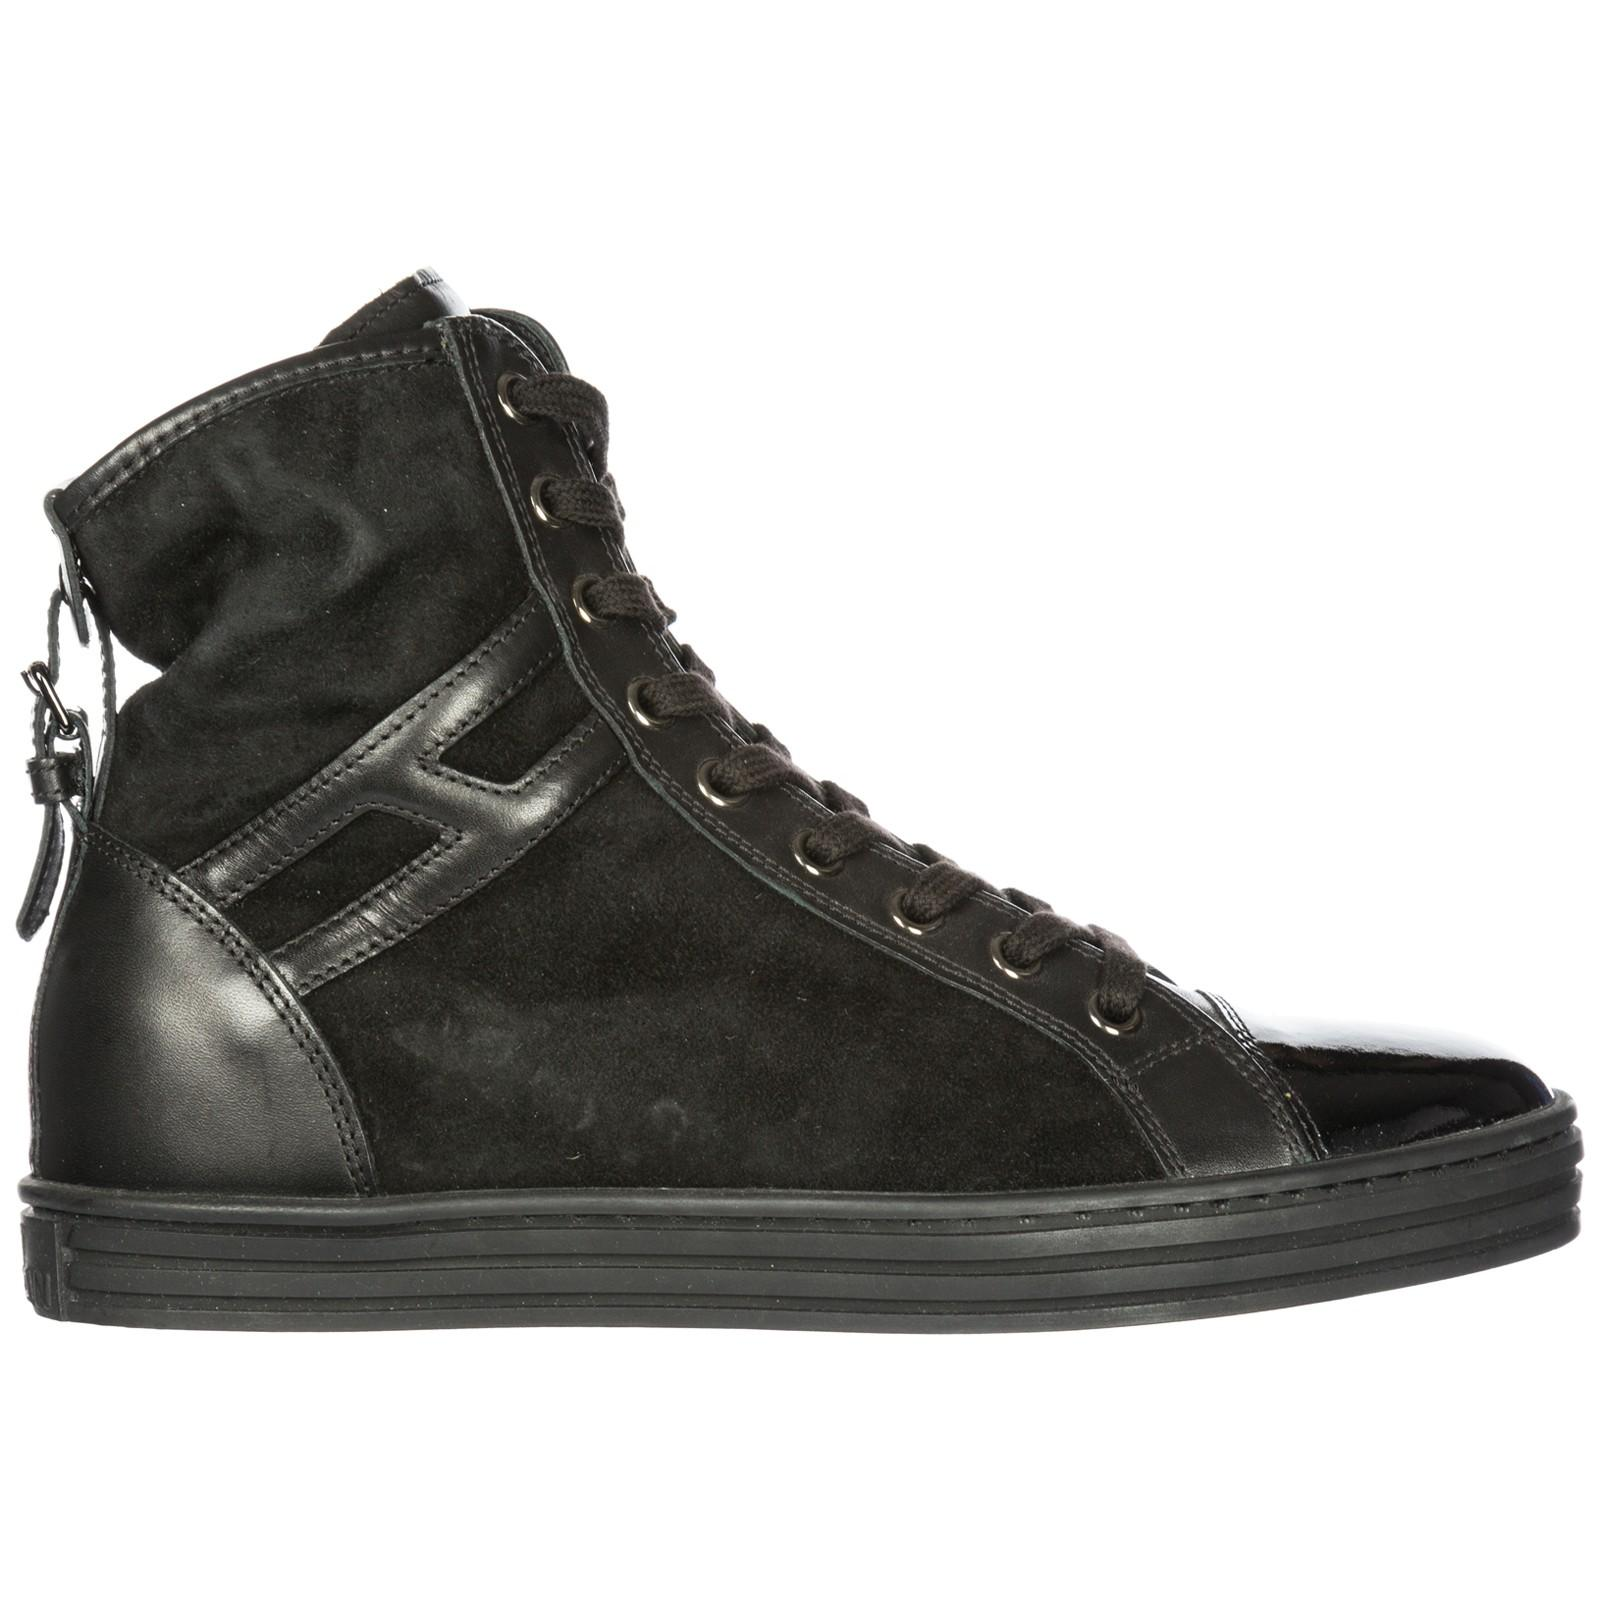 291022588 Hogan Rebel Women's Shoes High Top Suede Trainers Sneakers R182 In Black